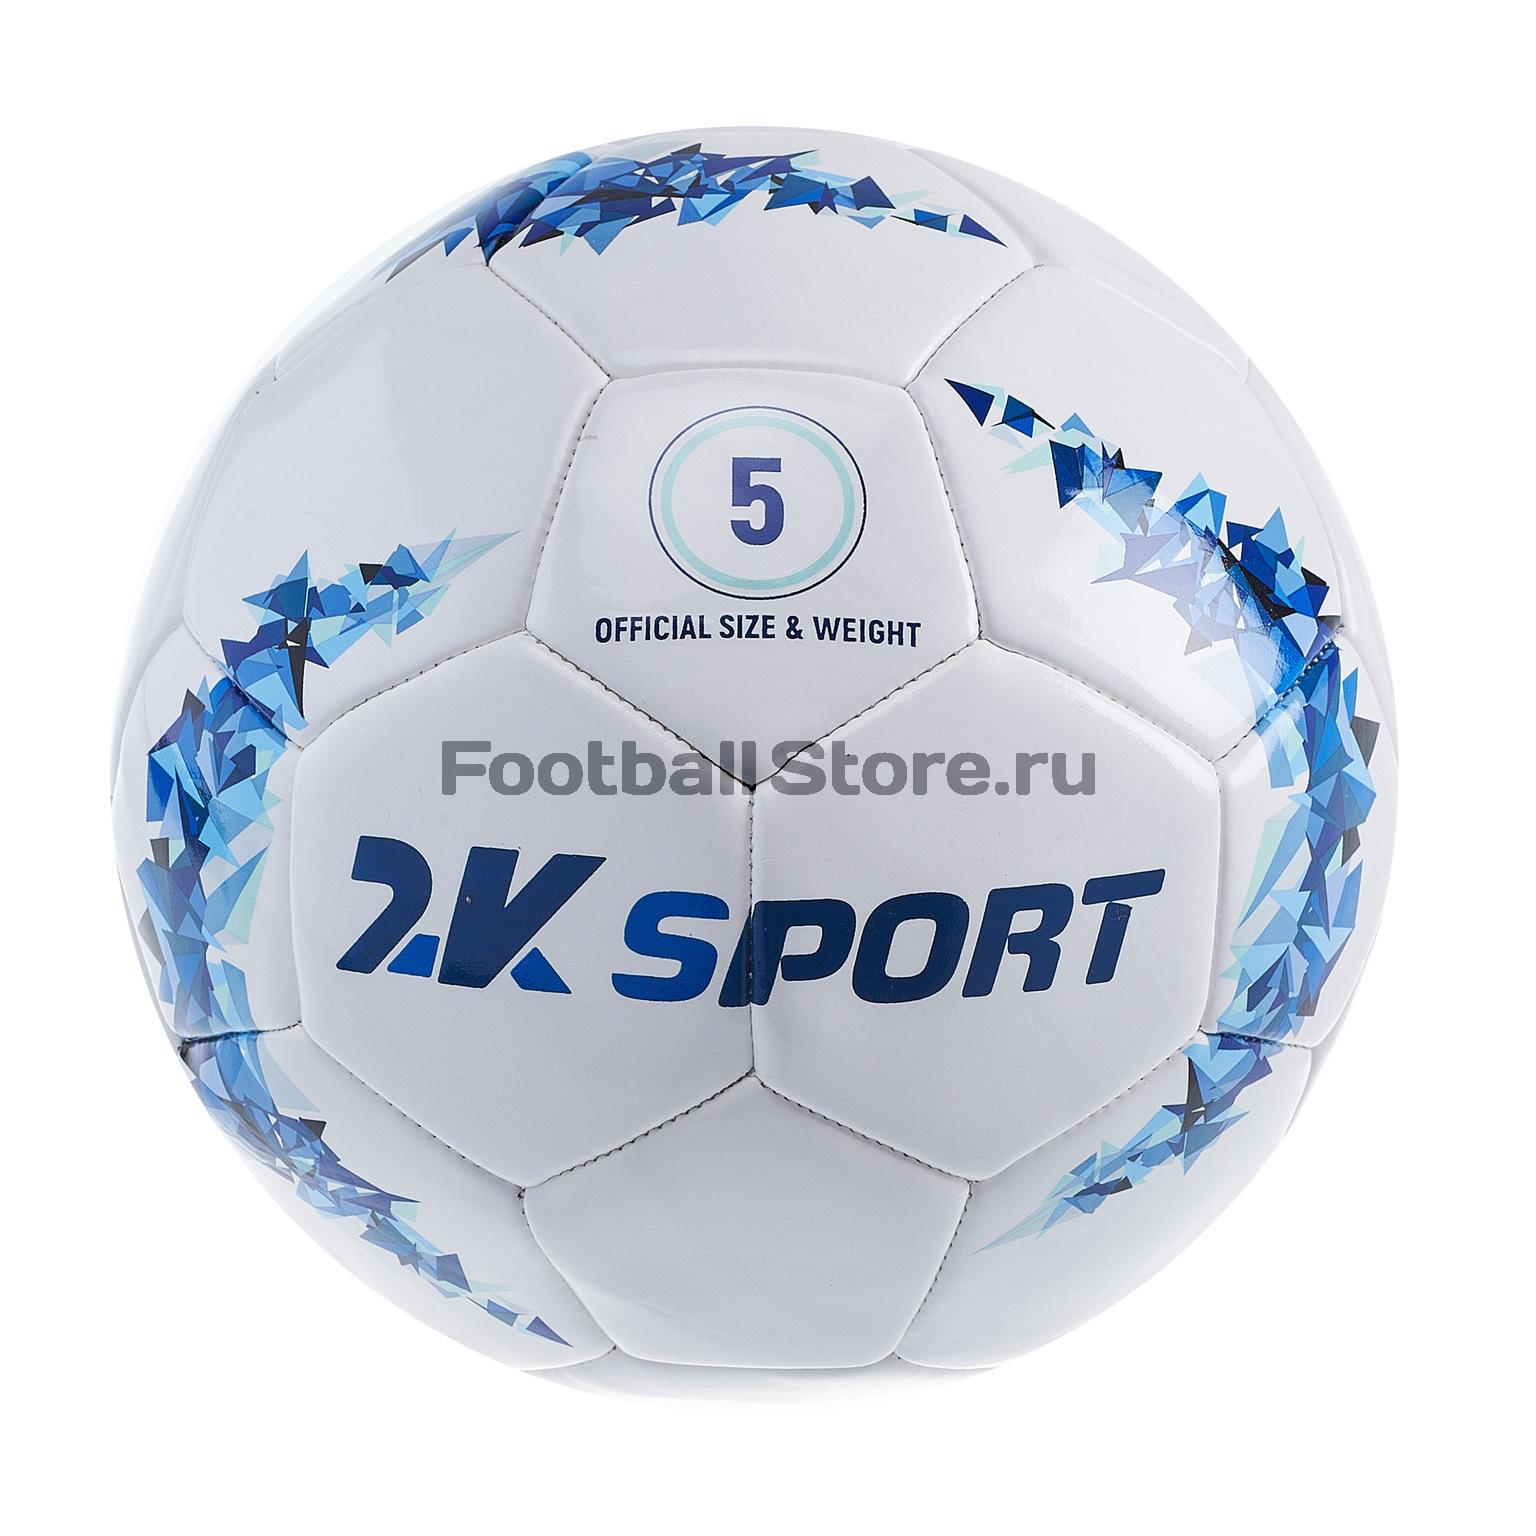 Футбольный мяч 2K Sport Crystal Optimal 127086